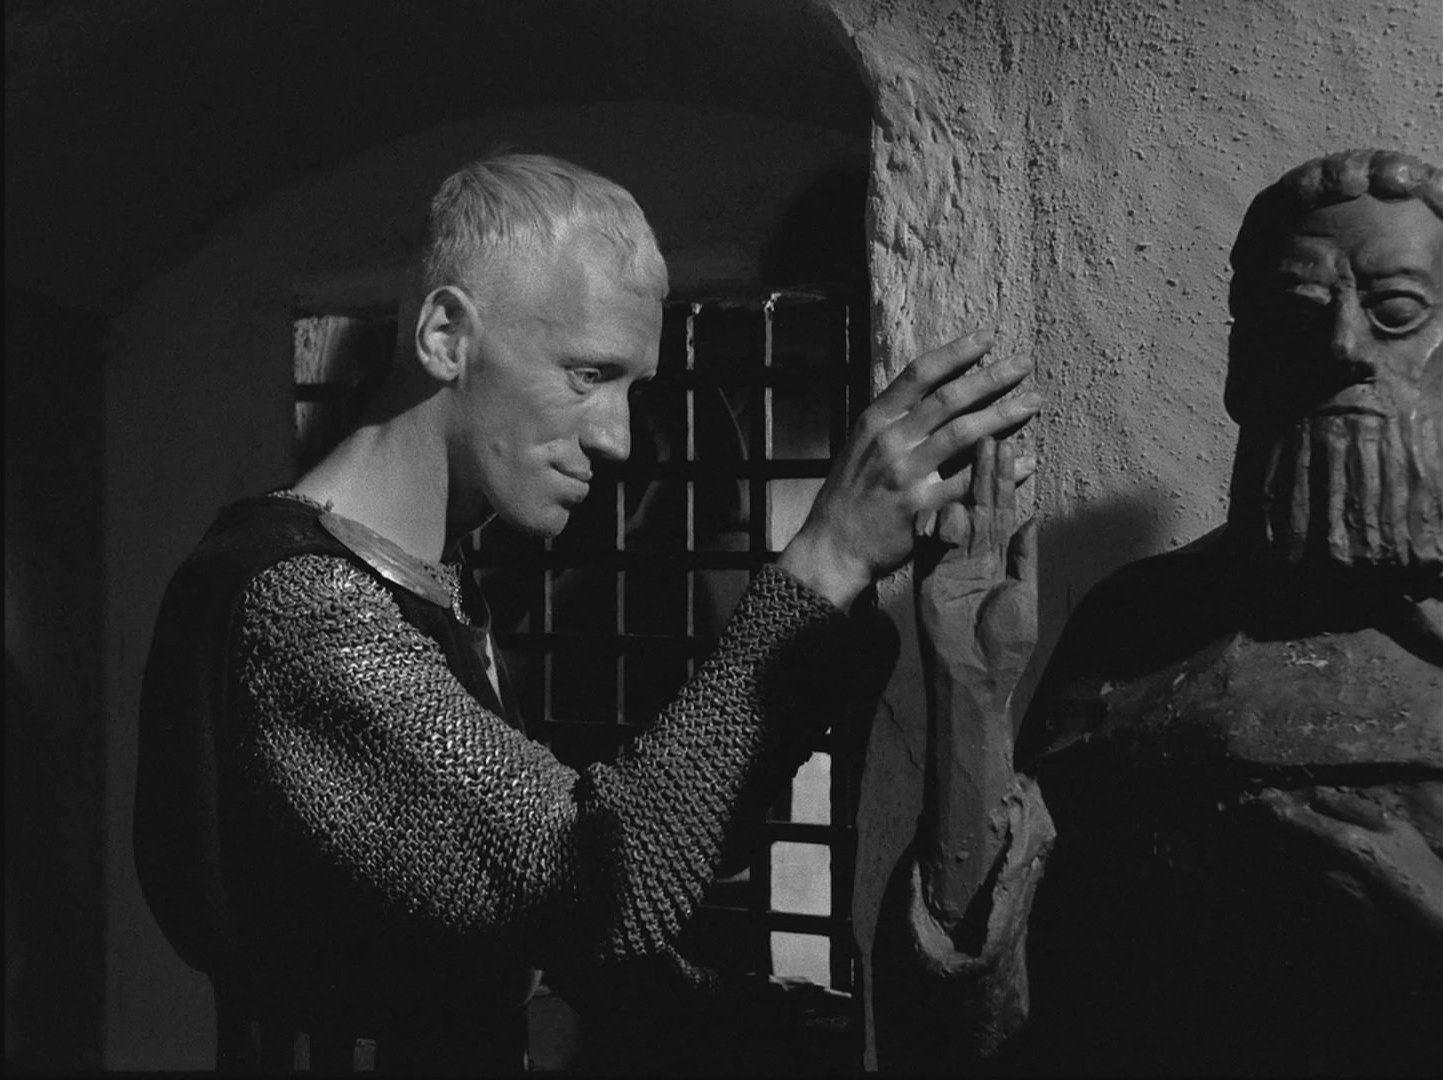 Max Von Sydow As Antonius Block-ის სურათის შედეგი